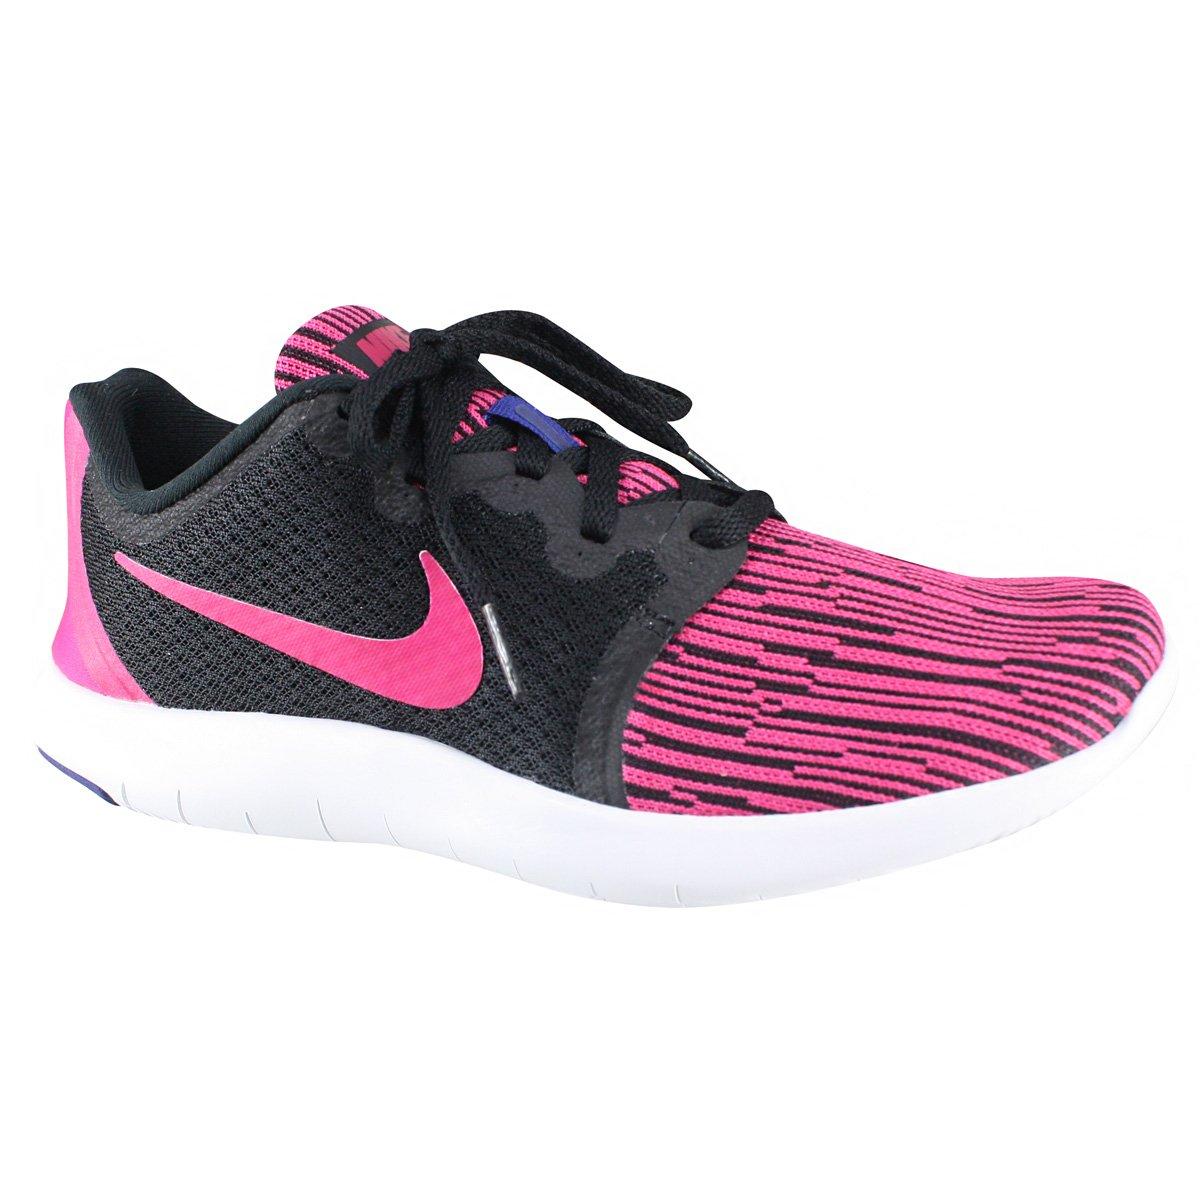 96a6a45d91 Tênis Feminino Nike Flex Contact 2 AA7409-003 - Preto Rosa ...